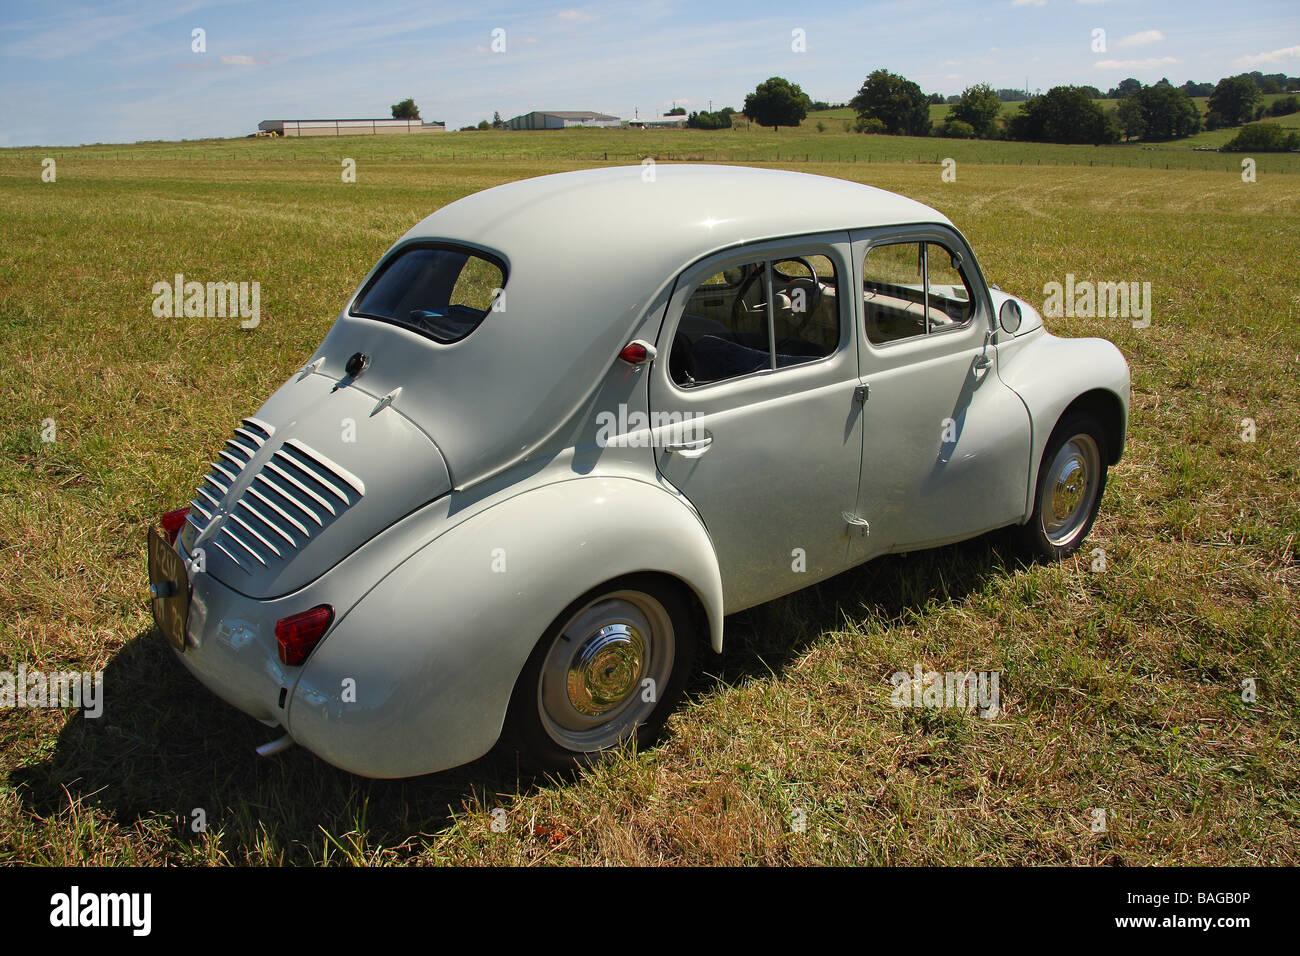 a well restored 1961 renault 4cv modele affair in a field